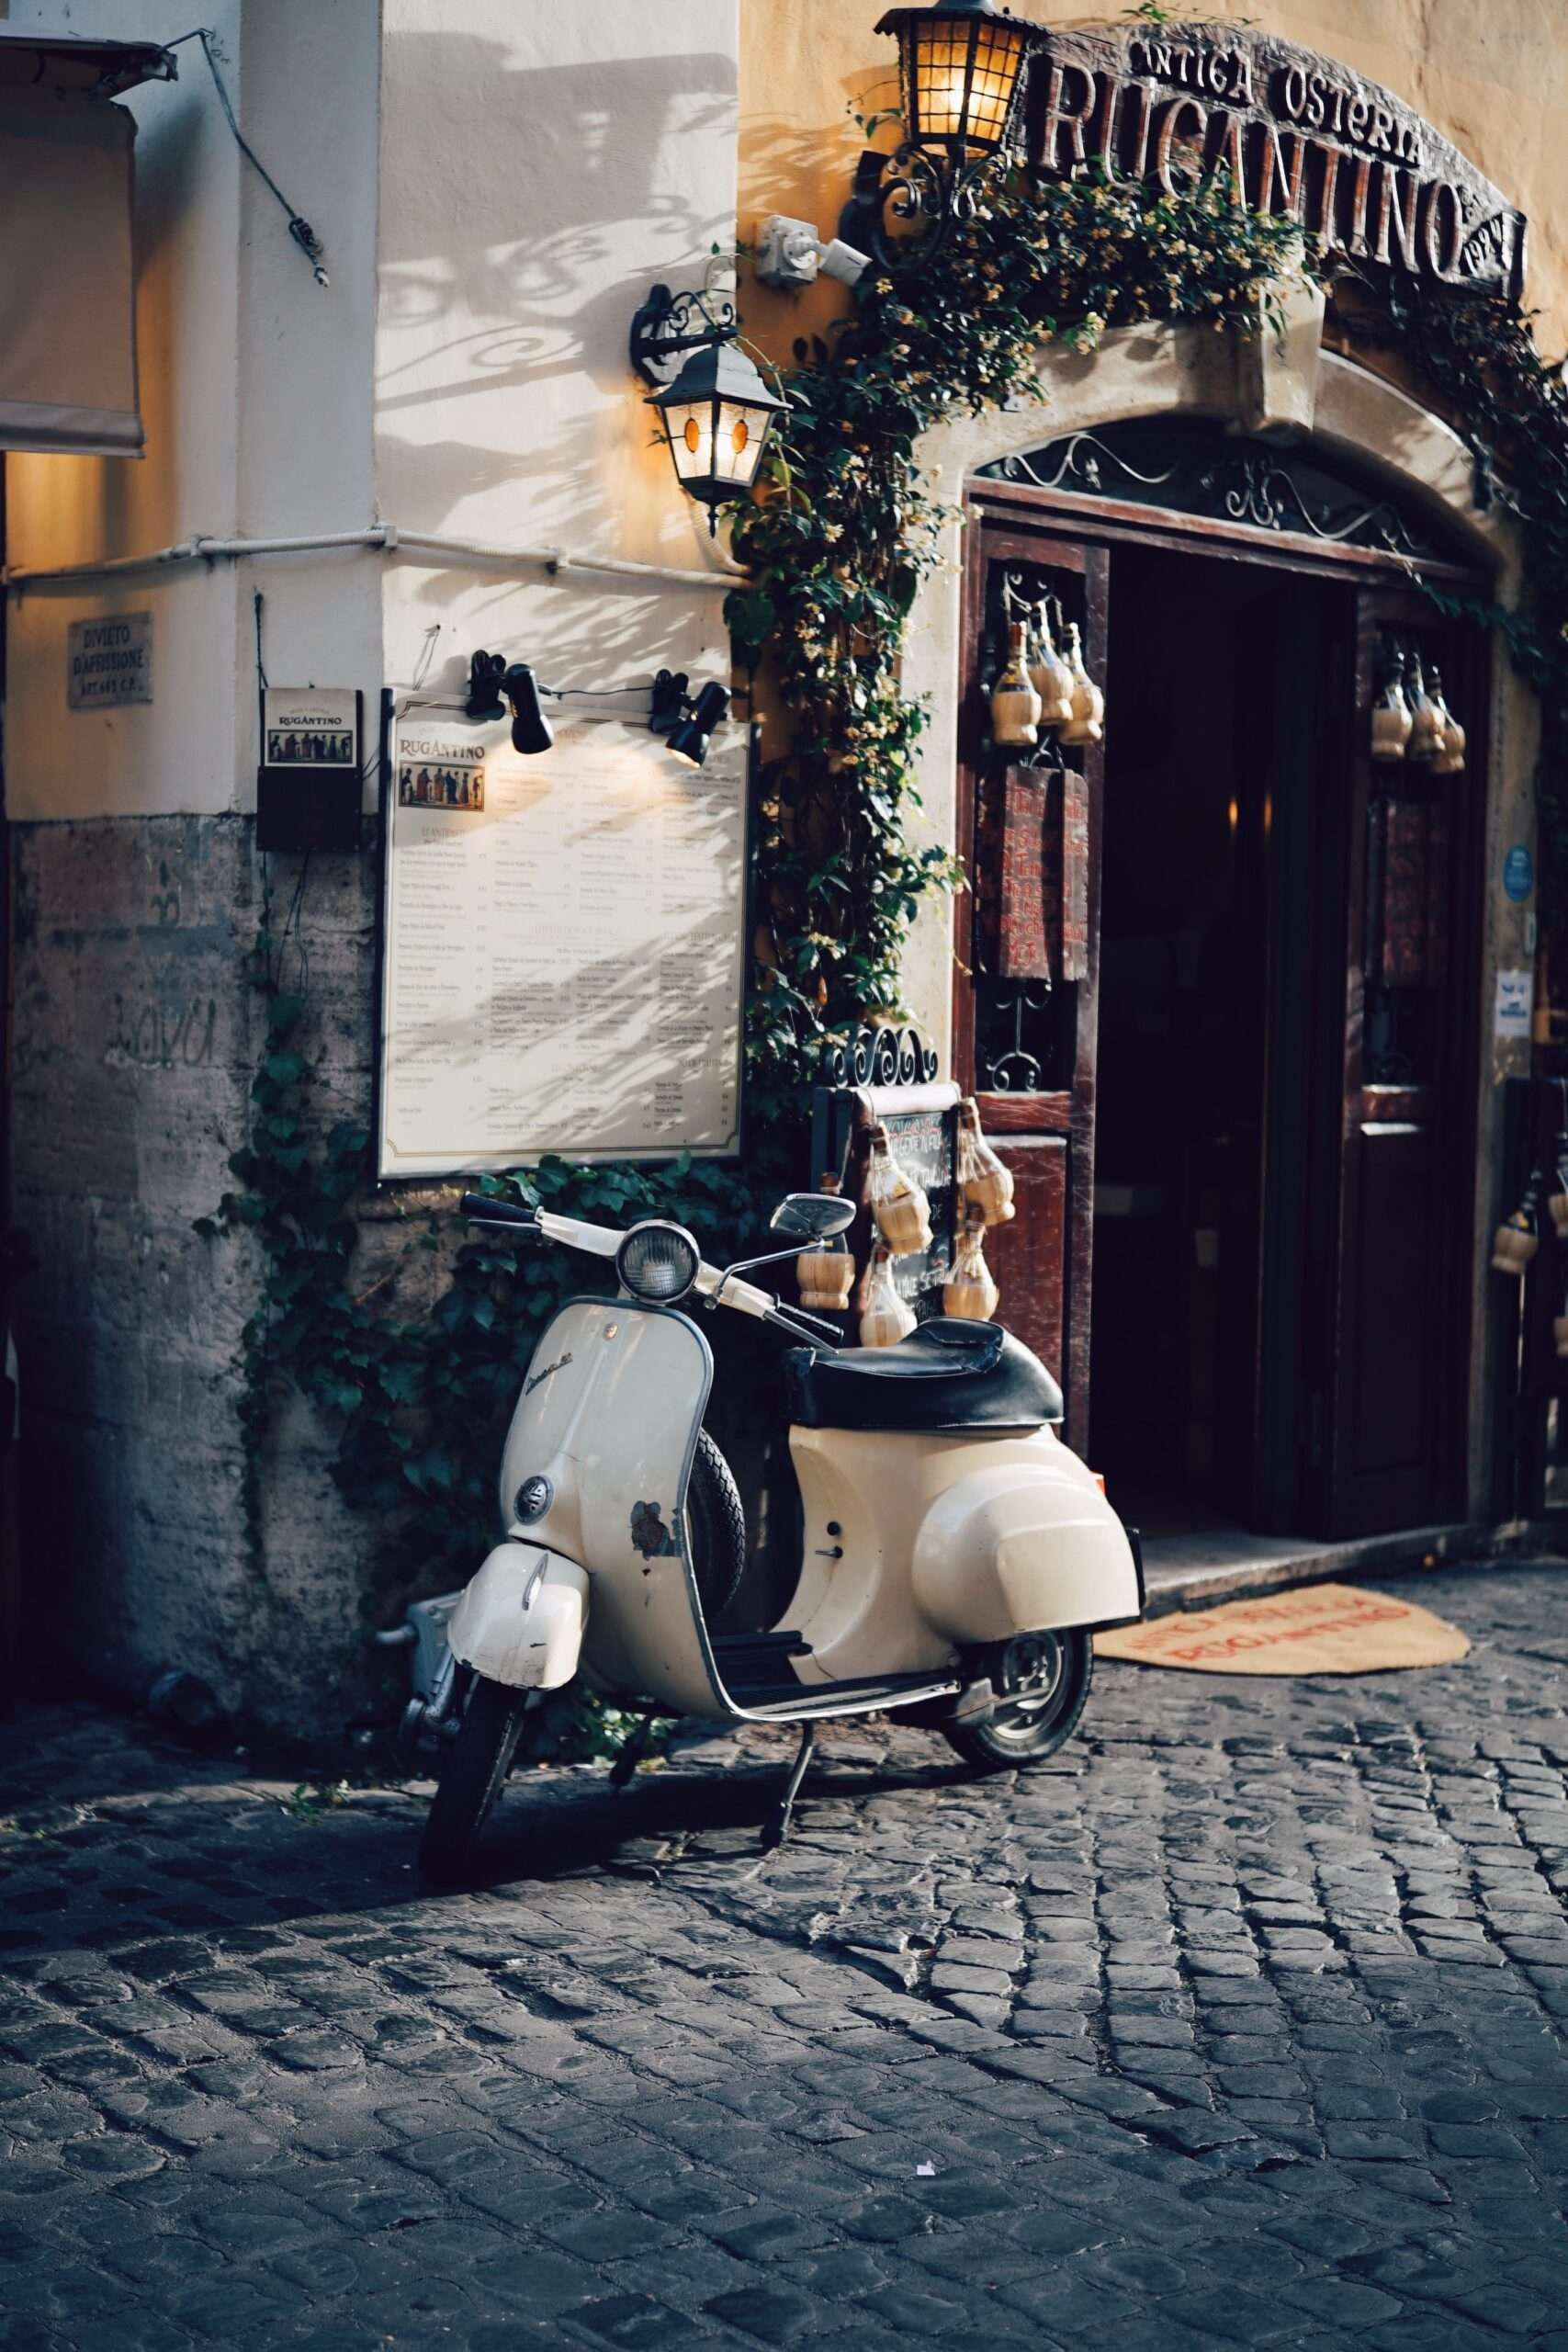 Vespa parked in old Rome neighbourhood Trastevere